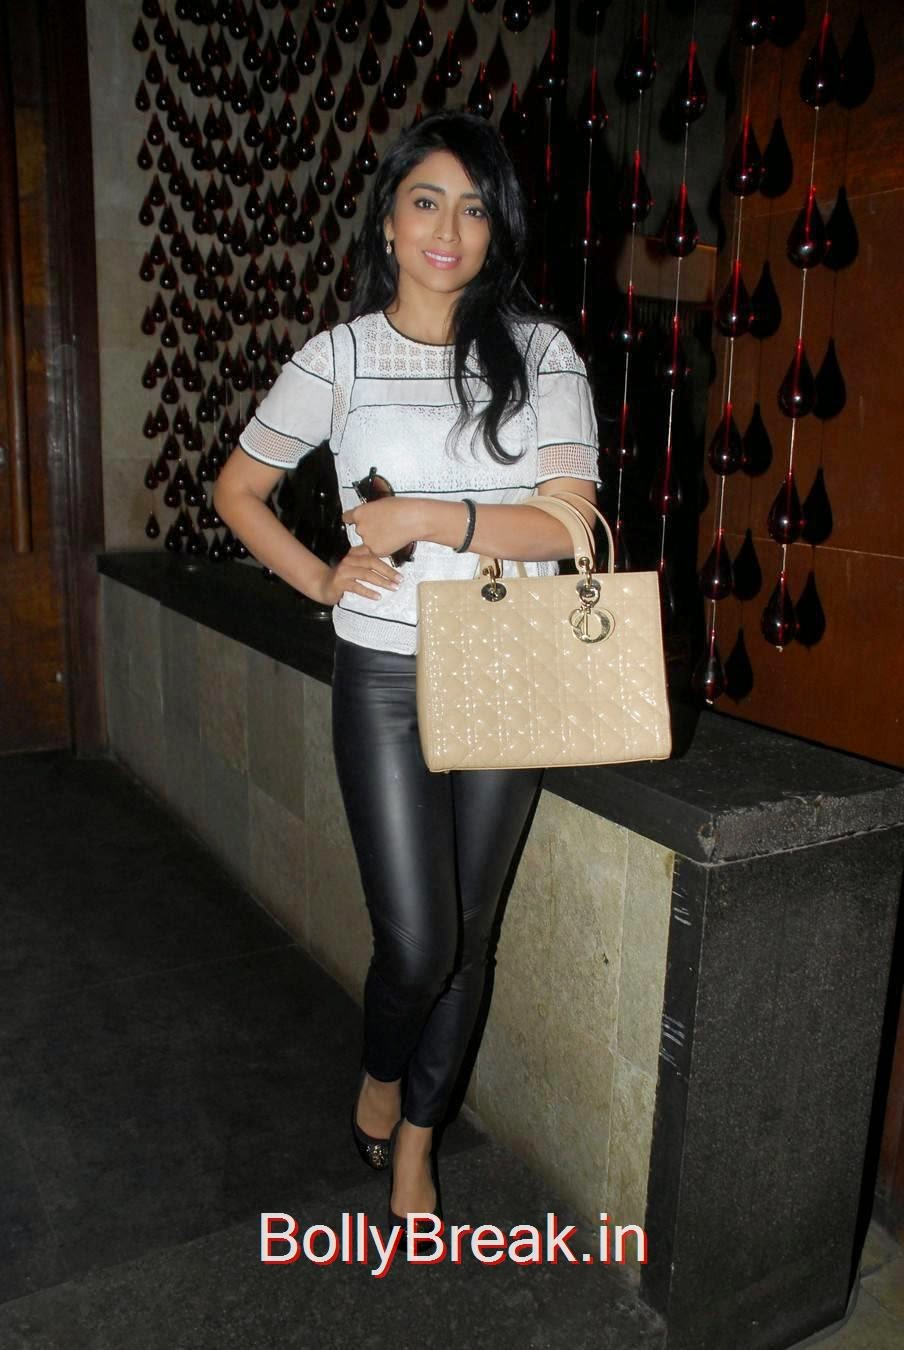 Telugu Actress Shriya Saran, Shriya Saran Hot Pics in Black Tight Leggings & Top at event